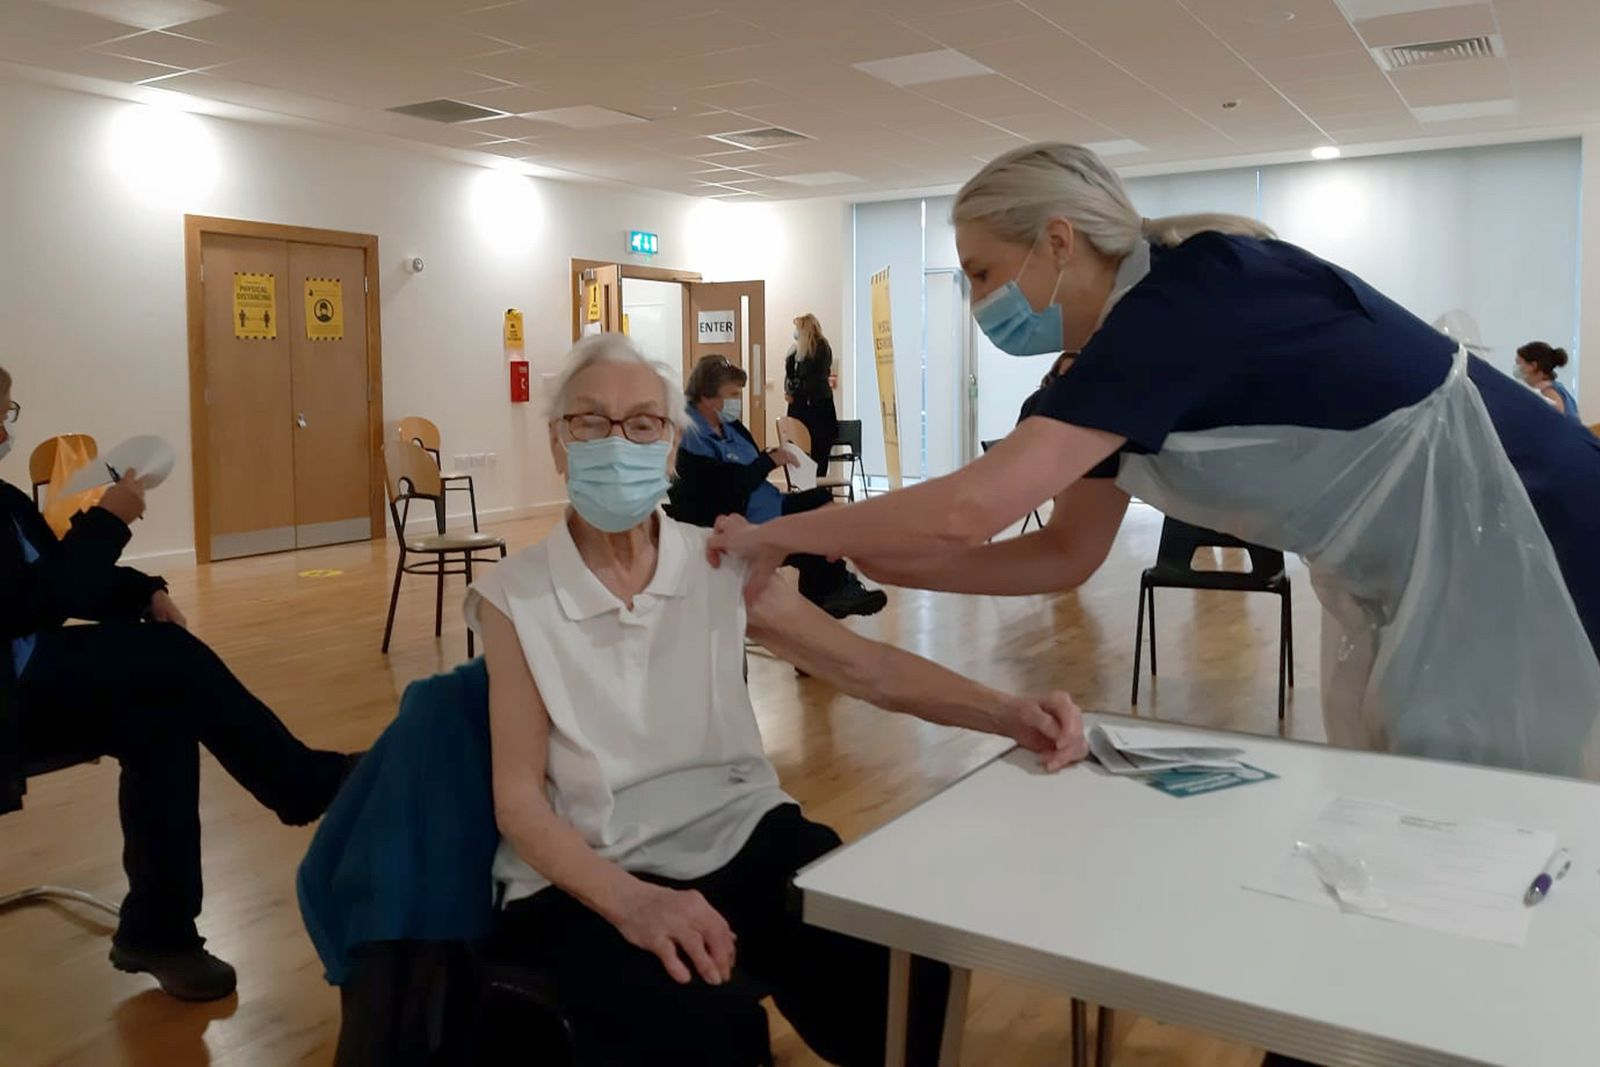 101-jährige erhält Corona-Impfung